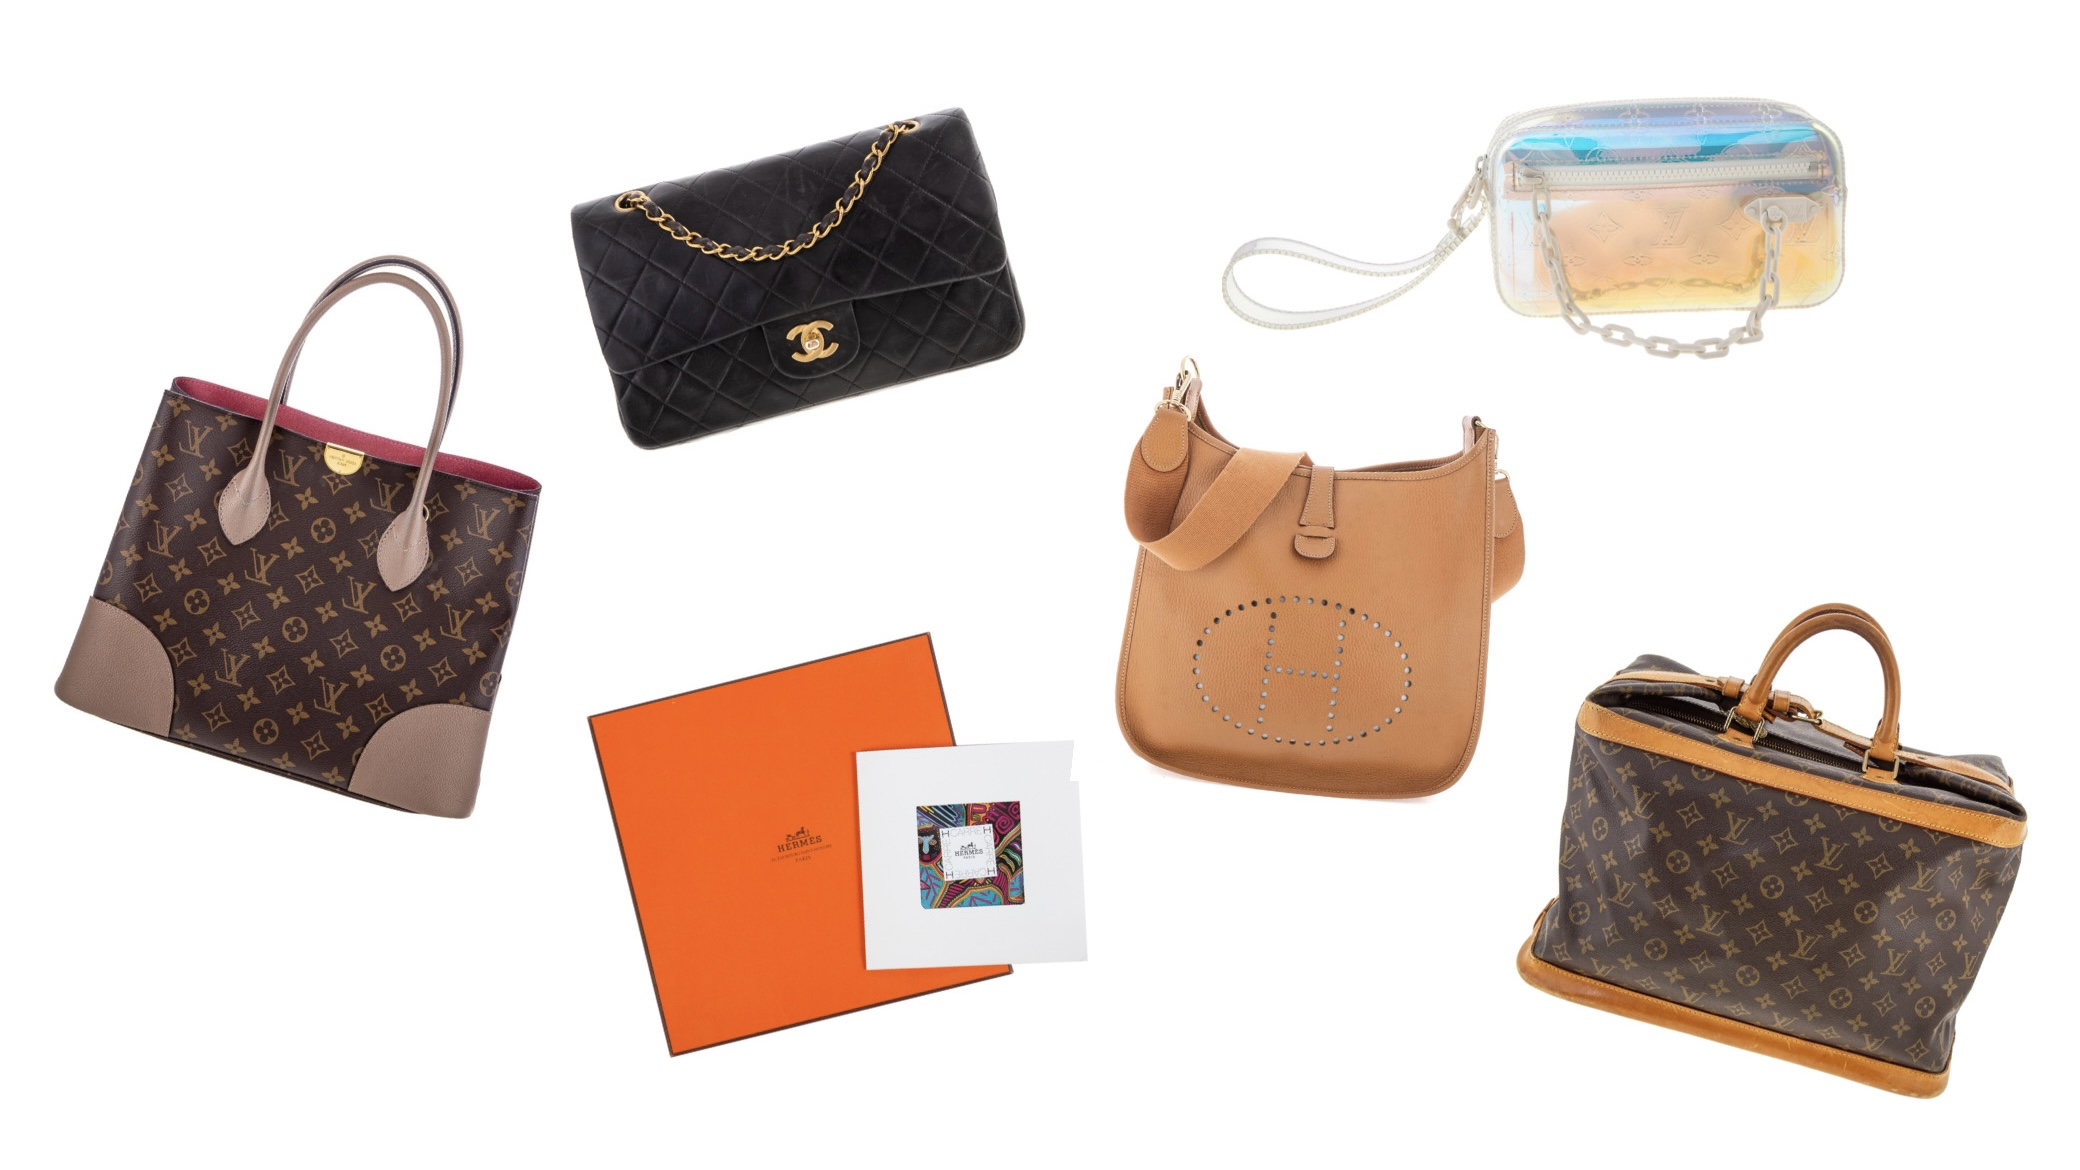 Record BreakingLuxury Handbag & Accessories Auction